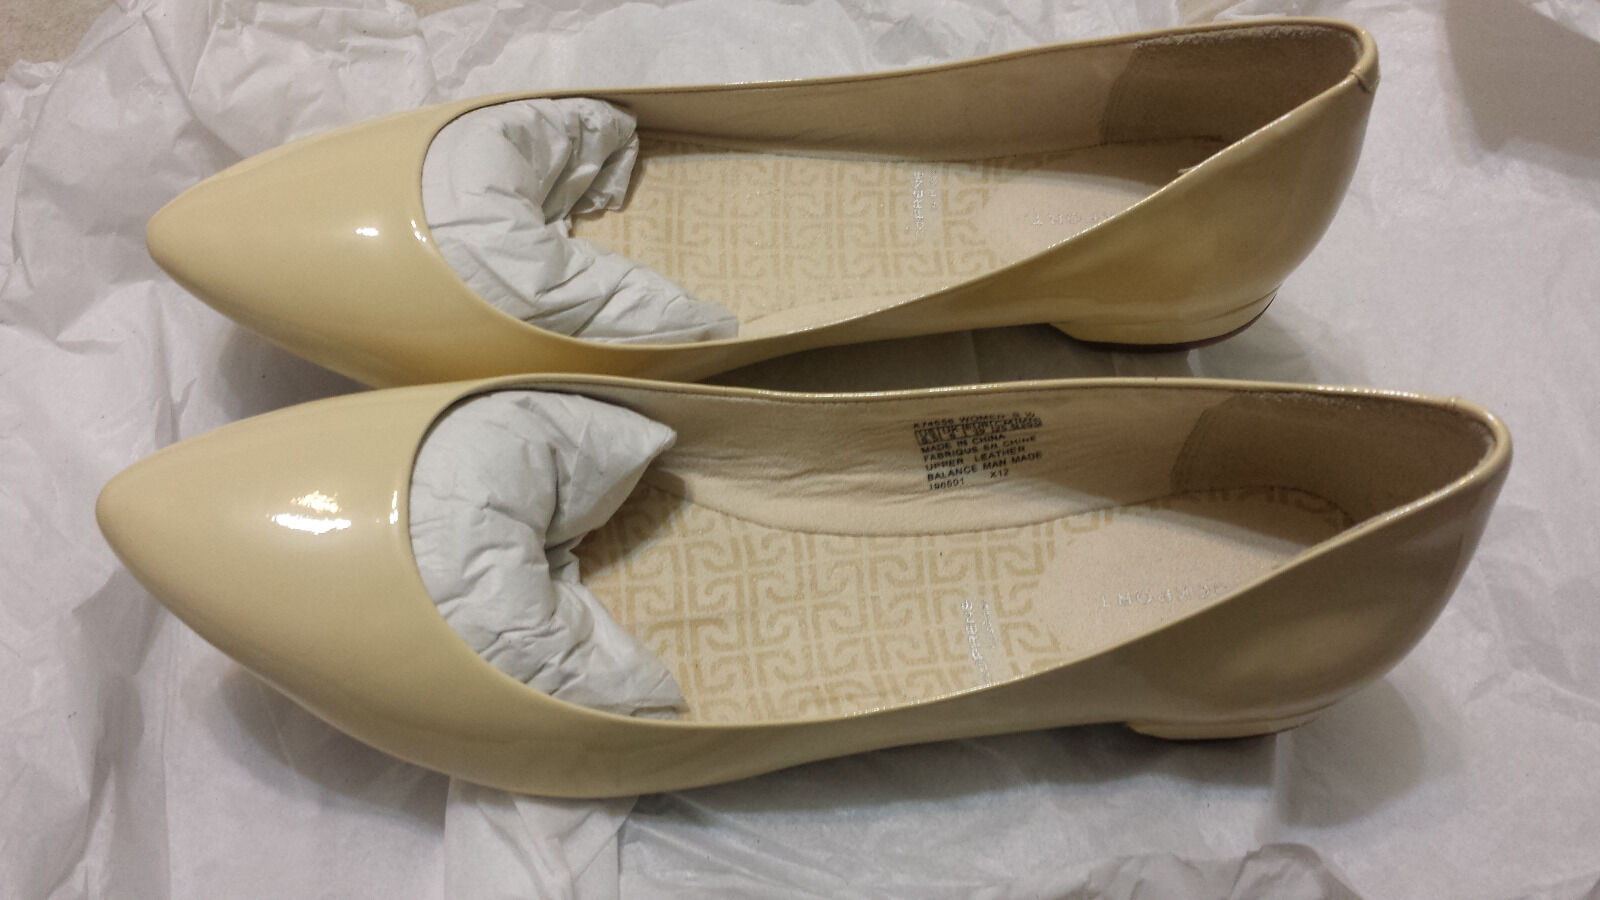 BNIB Rockport Ashika Flat Scooped Ballet Macadamia Beige Patent Leder 8.5 W